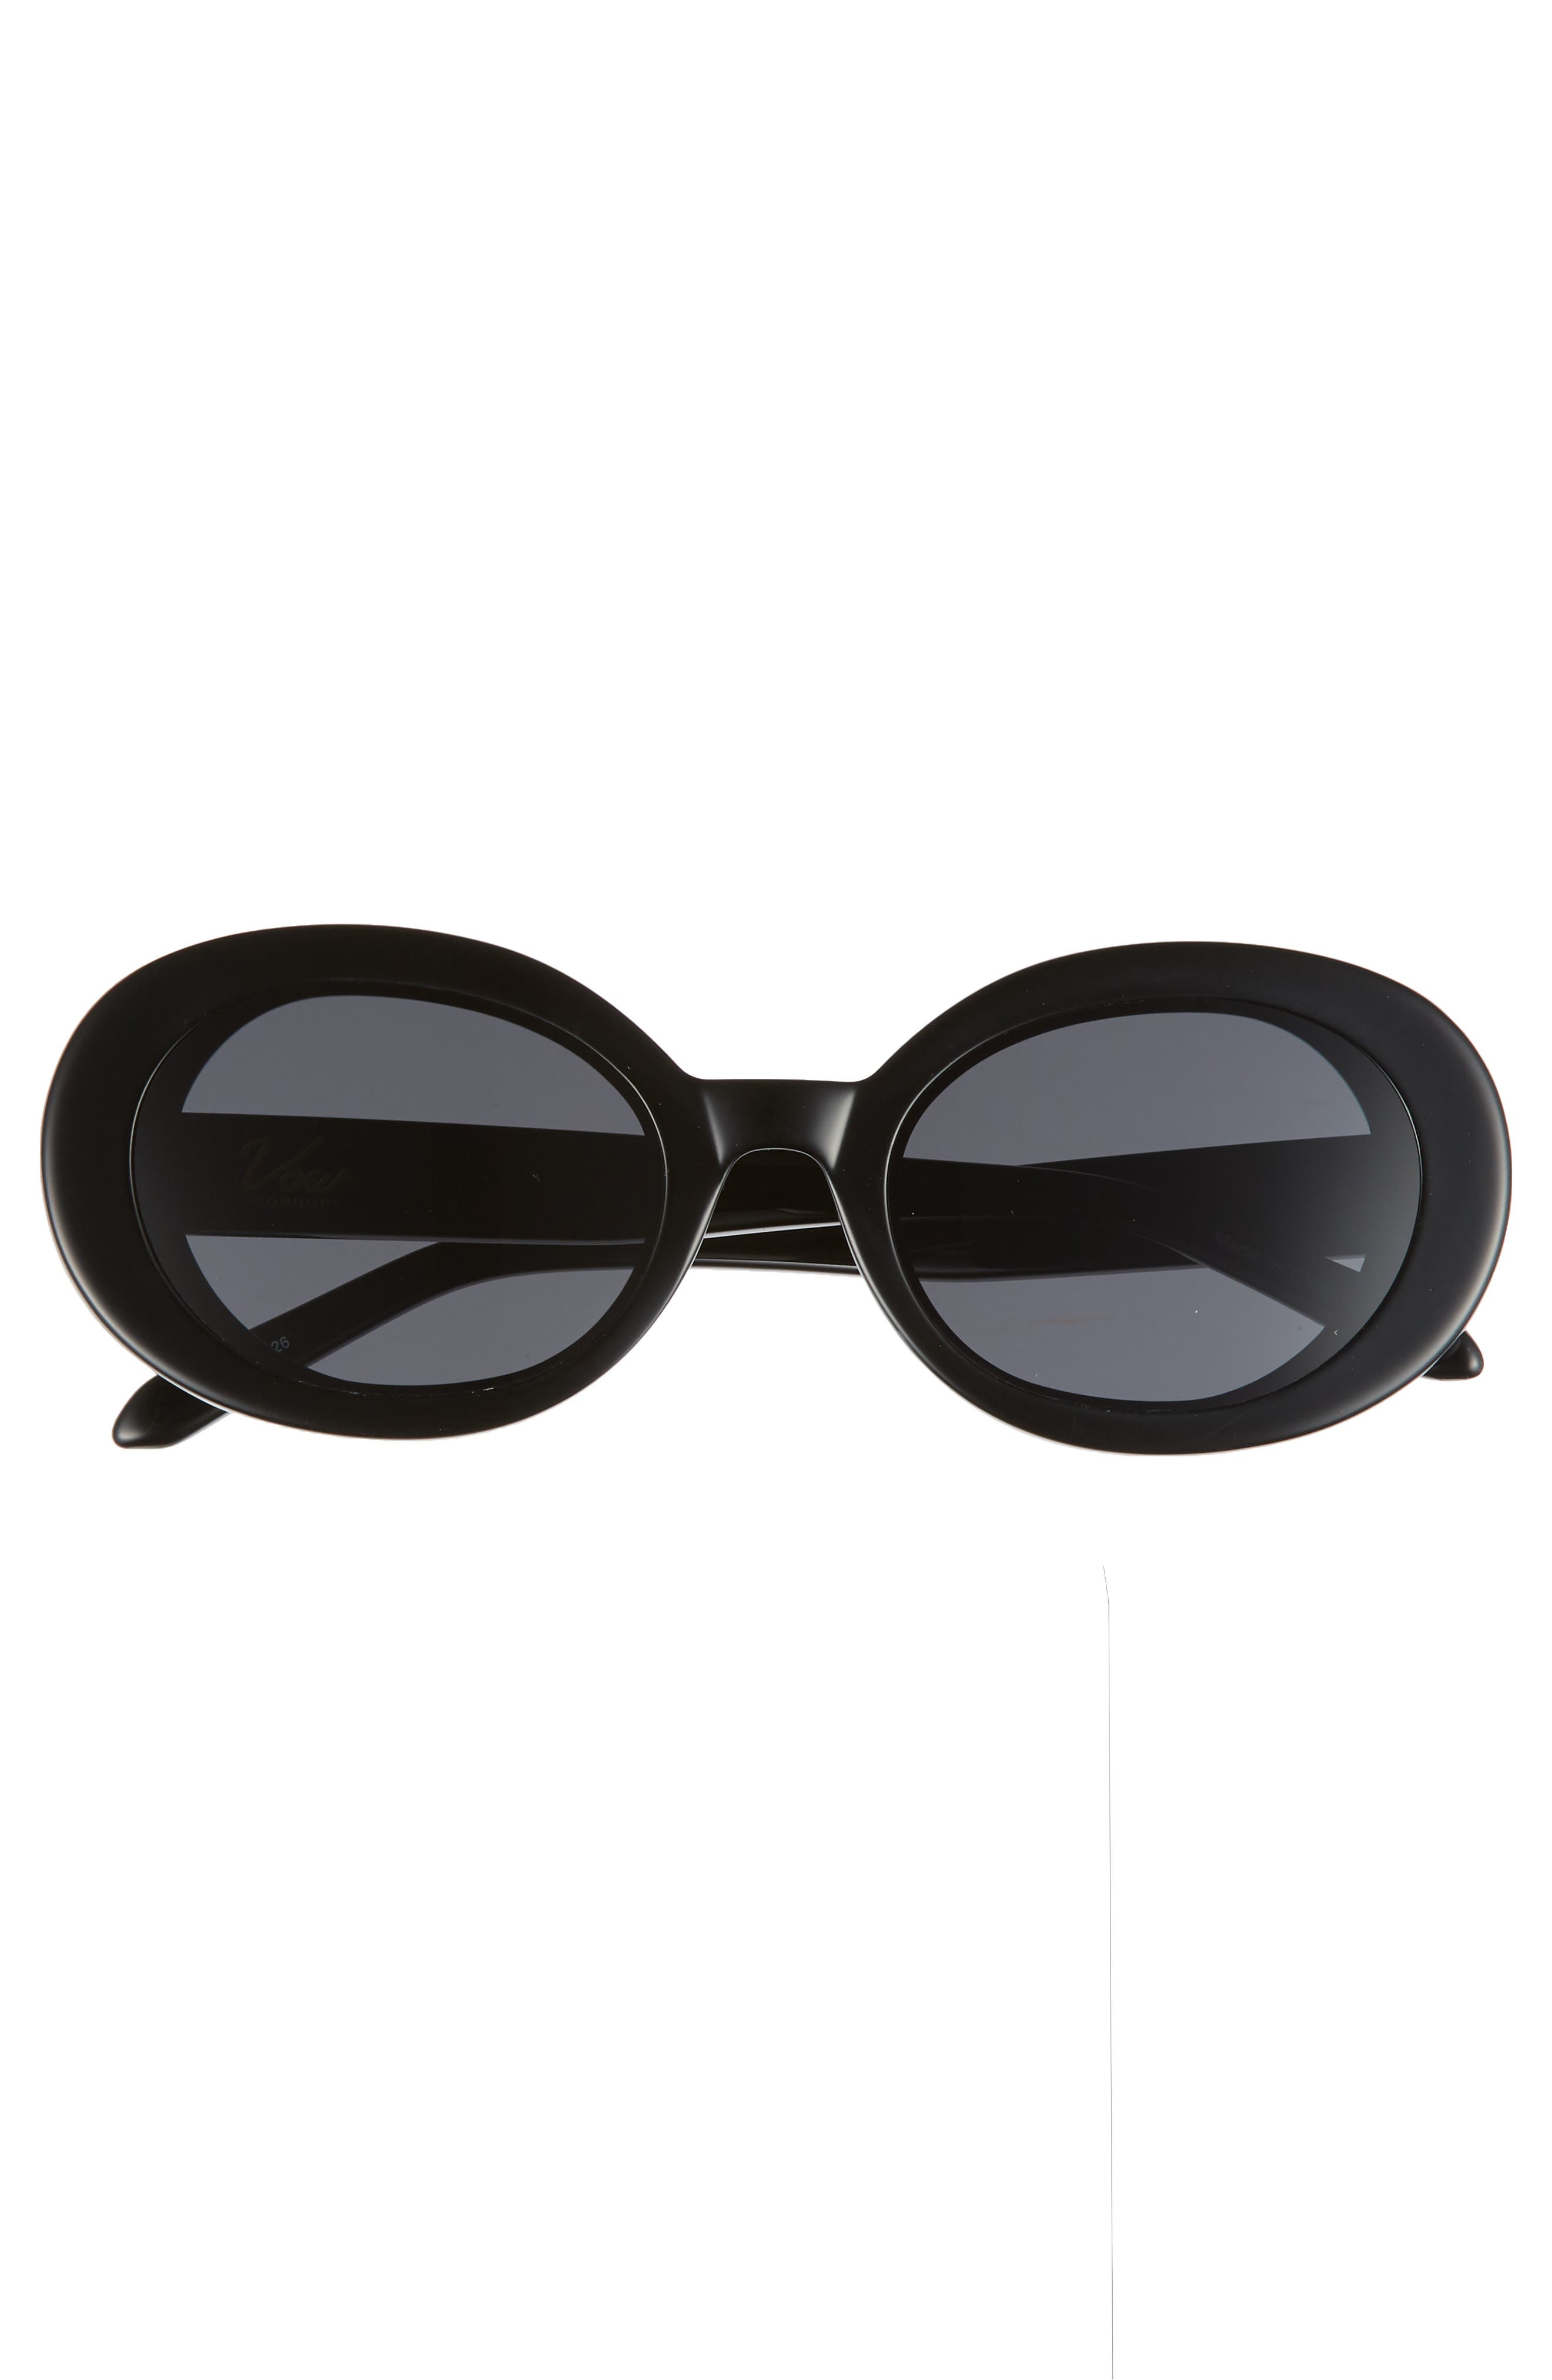 Selena 52mm Oval Sunglasses,                             Alternate thumbnail 3, color,                             BLACK/ SMOKE